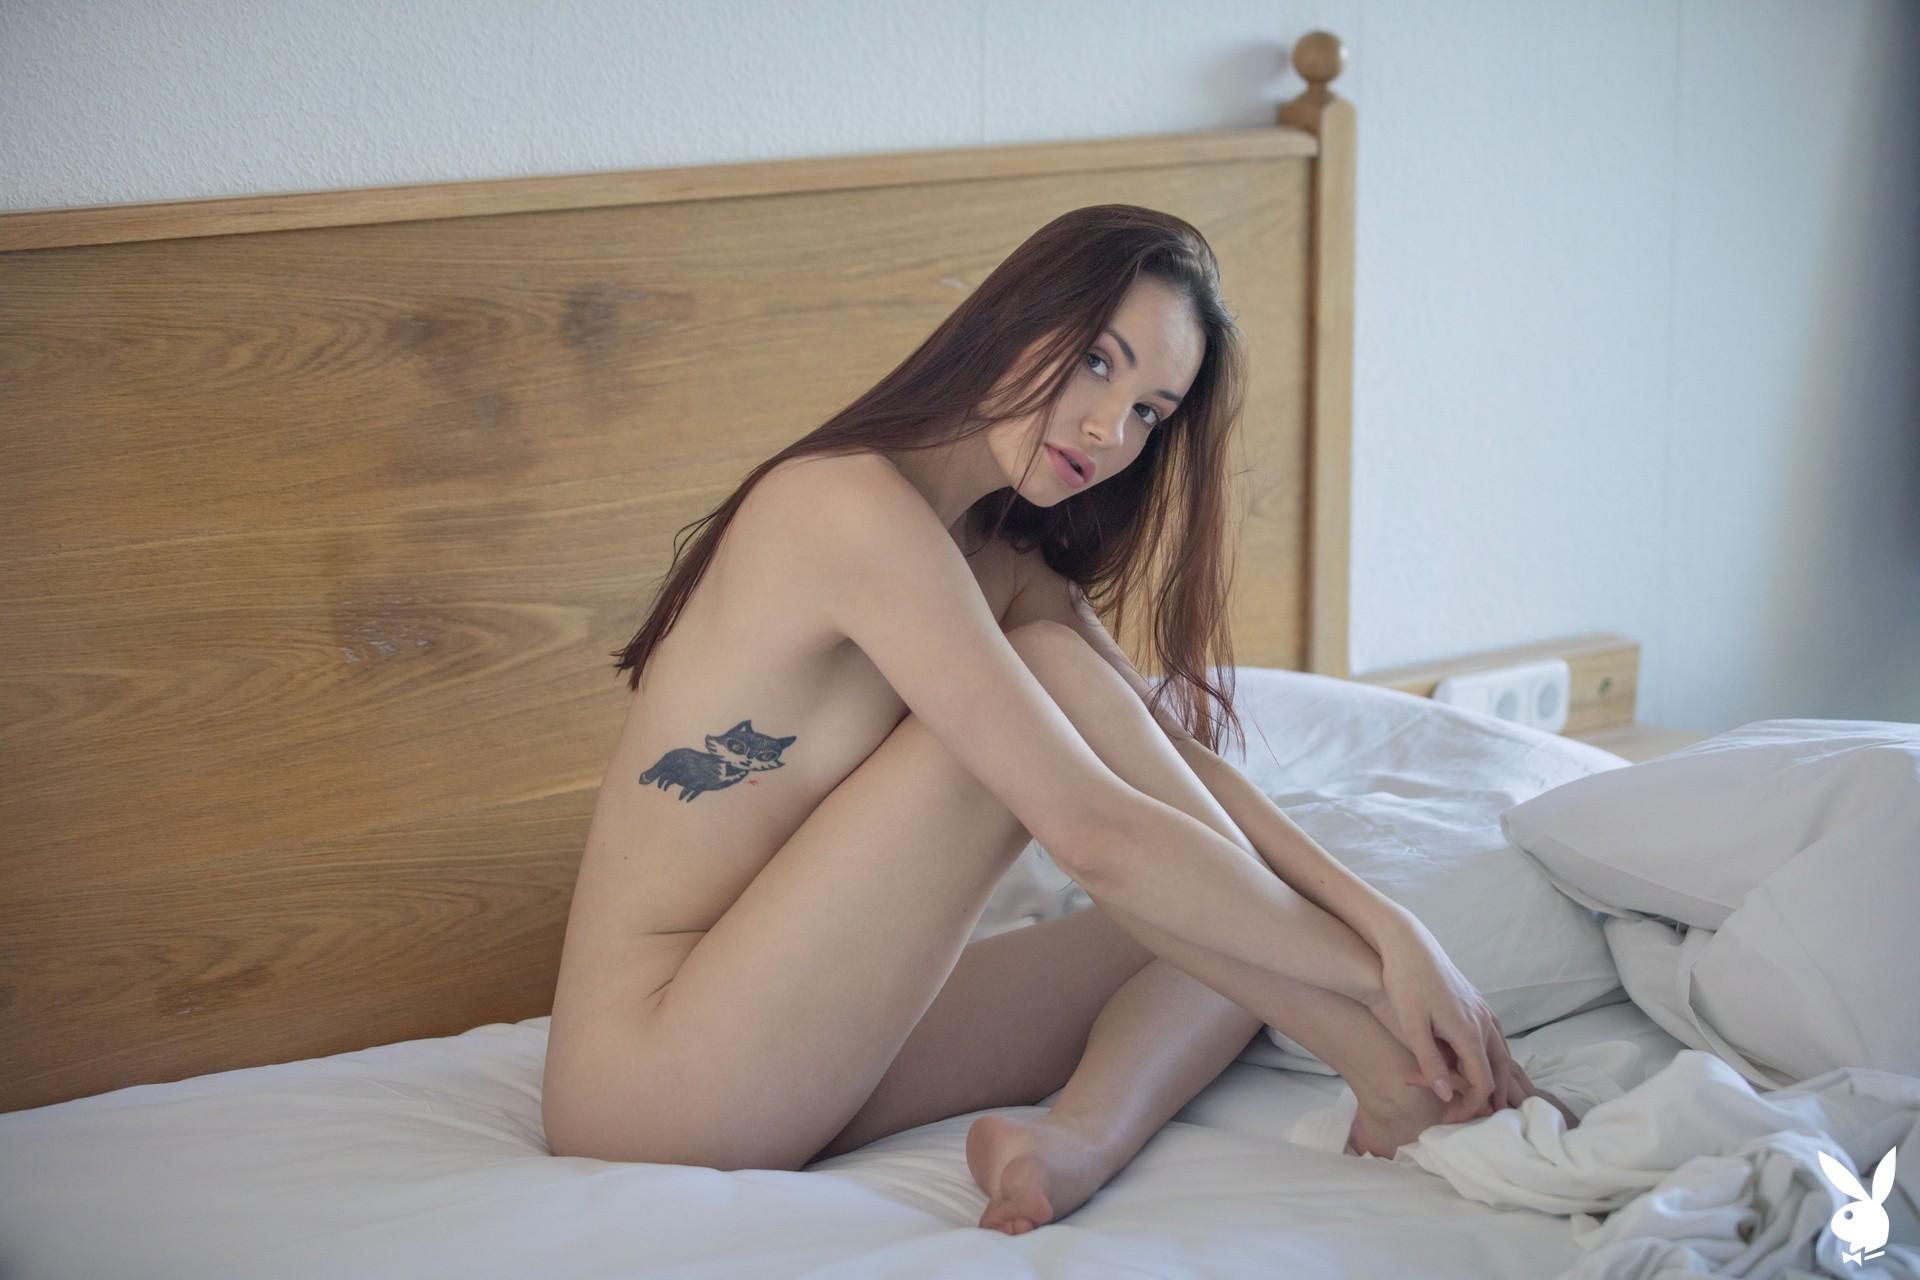 Elilith Noir In Tucked Away Playboy Plus (18)